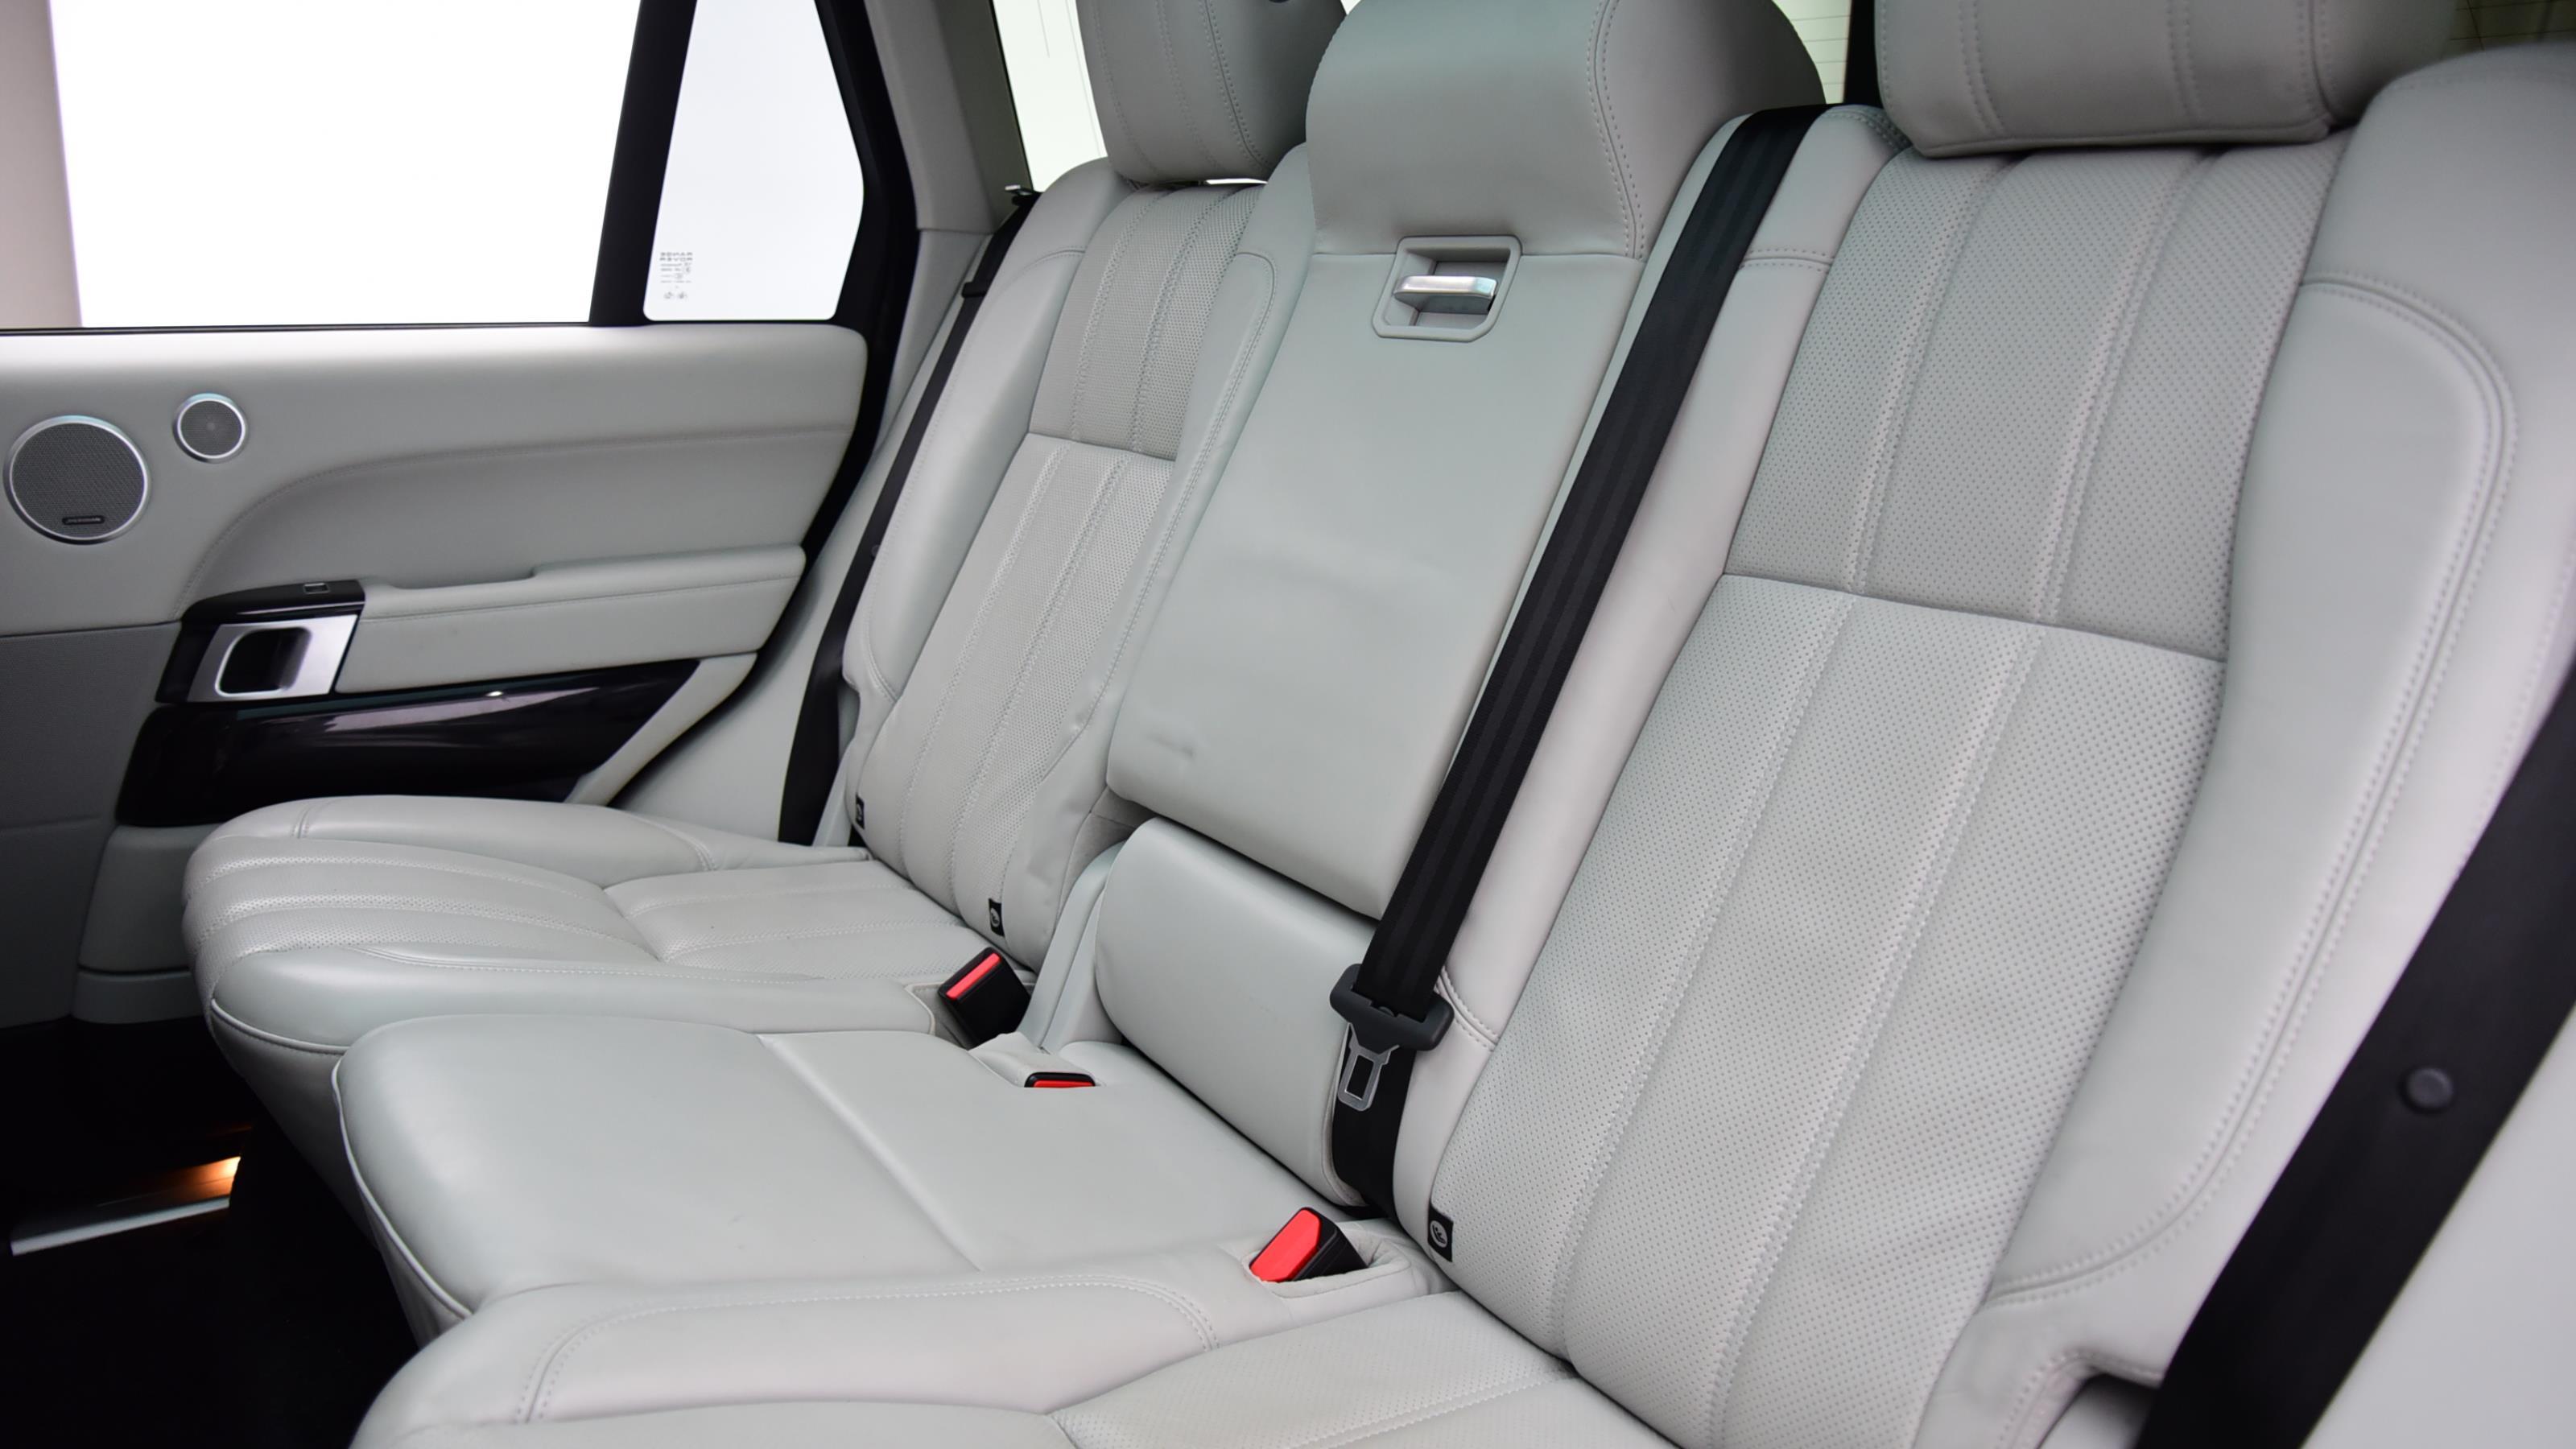 Used 2017 Land Rover RANGE ROVER 3.0 TDV6 Vogue 4dr Auto WHITE at Saxton4x4